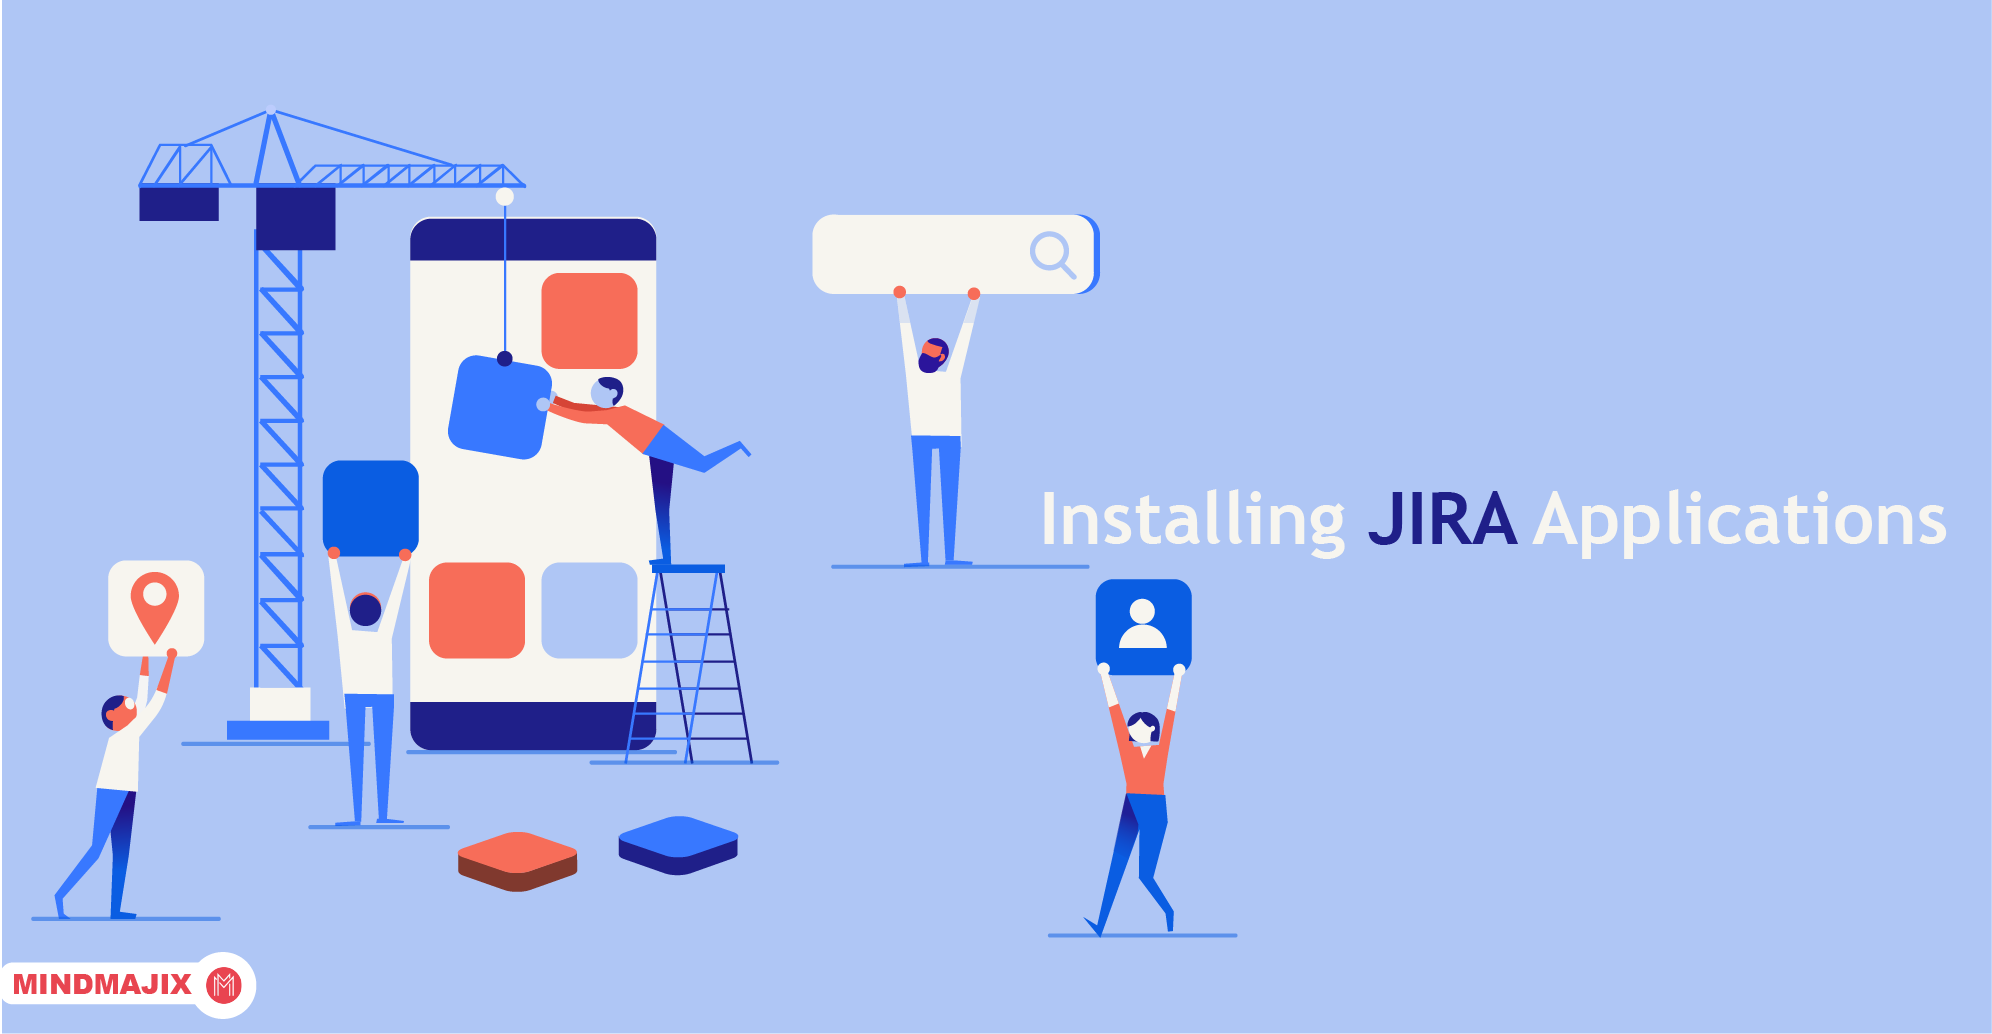 Installation of Jira